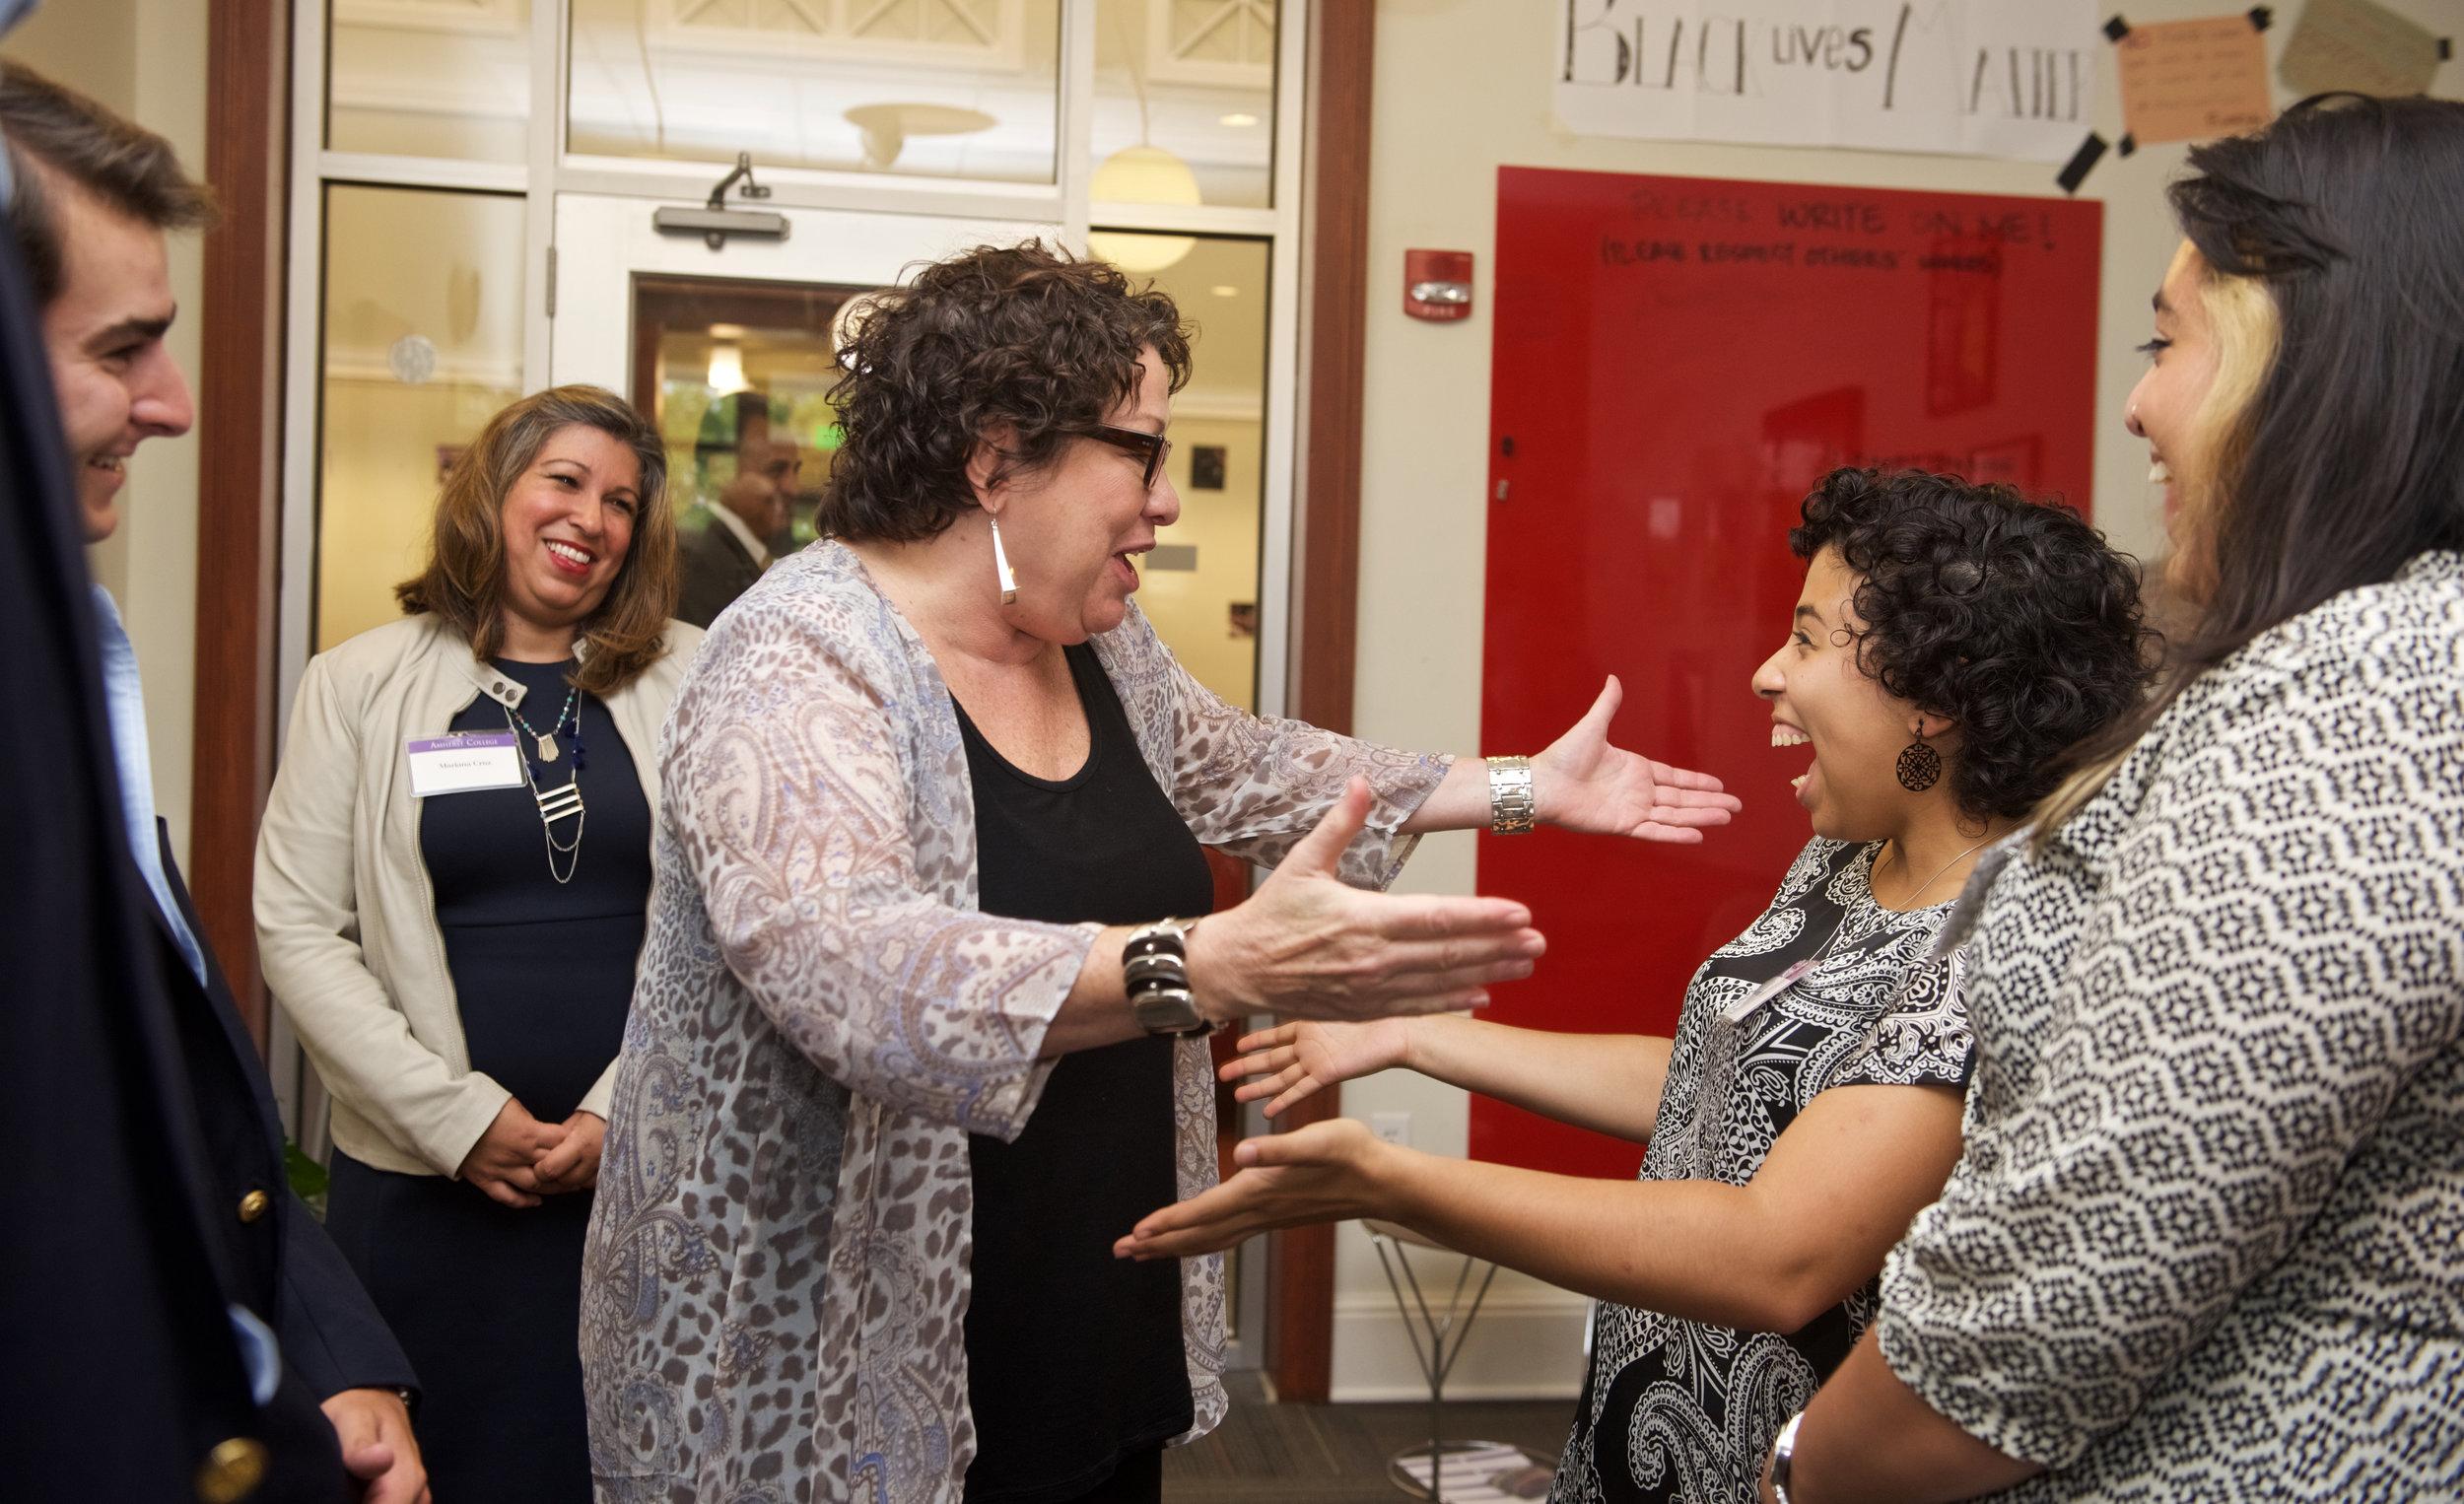 Sonia Sotomayor visits Amherst